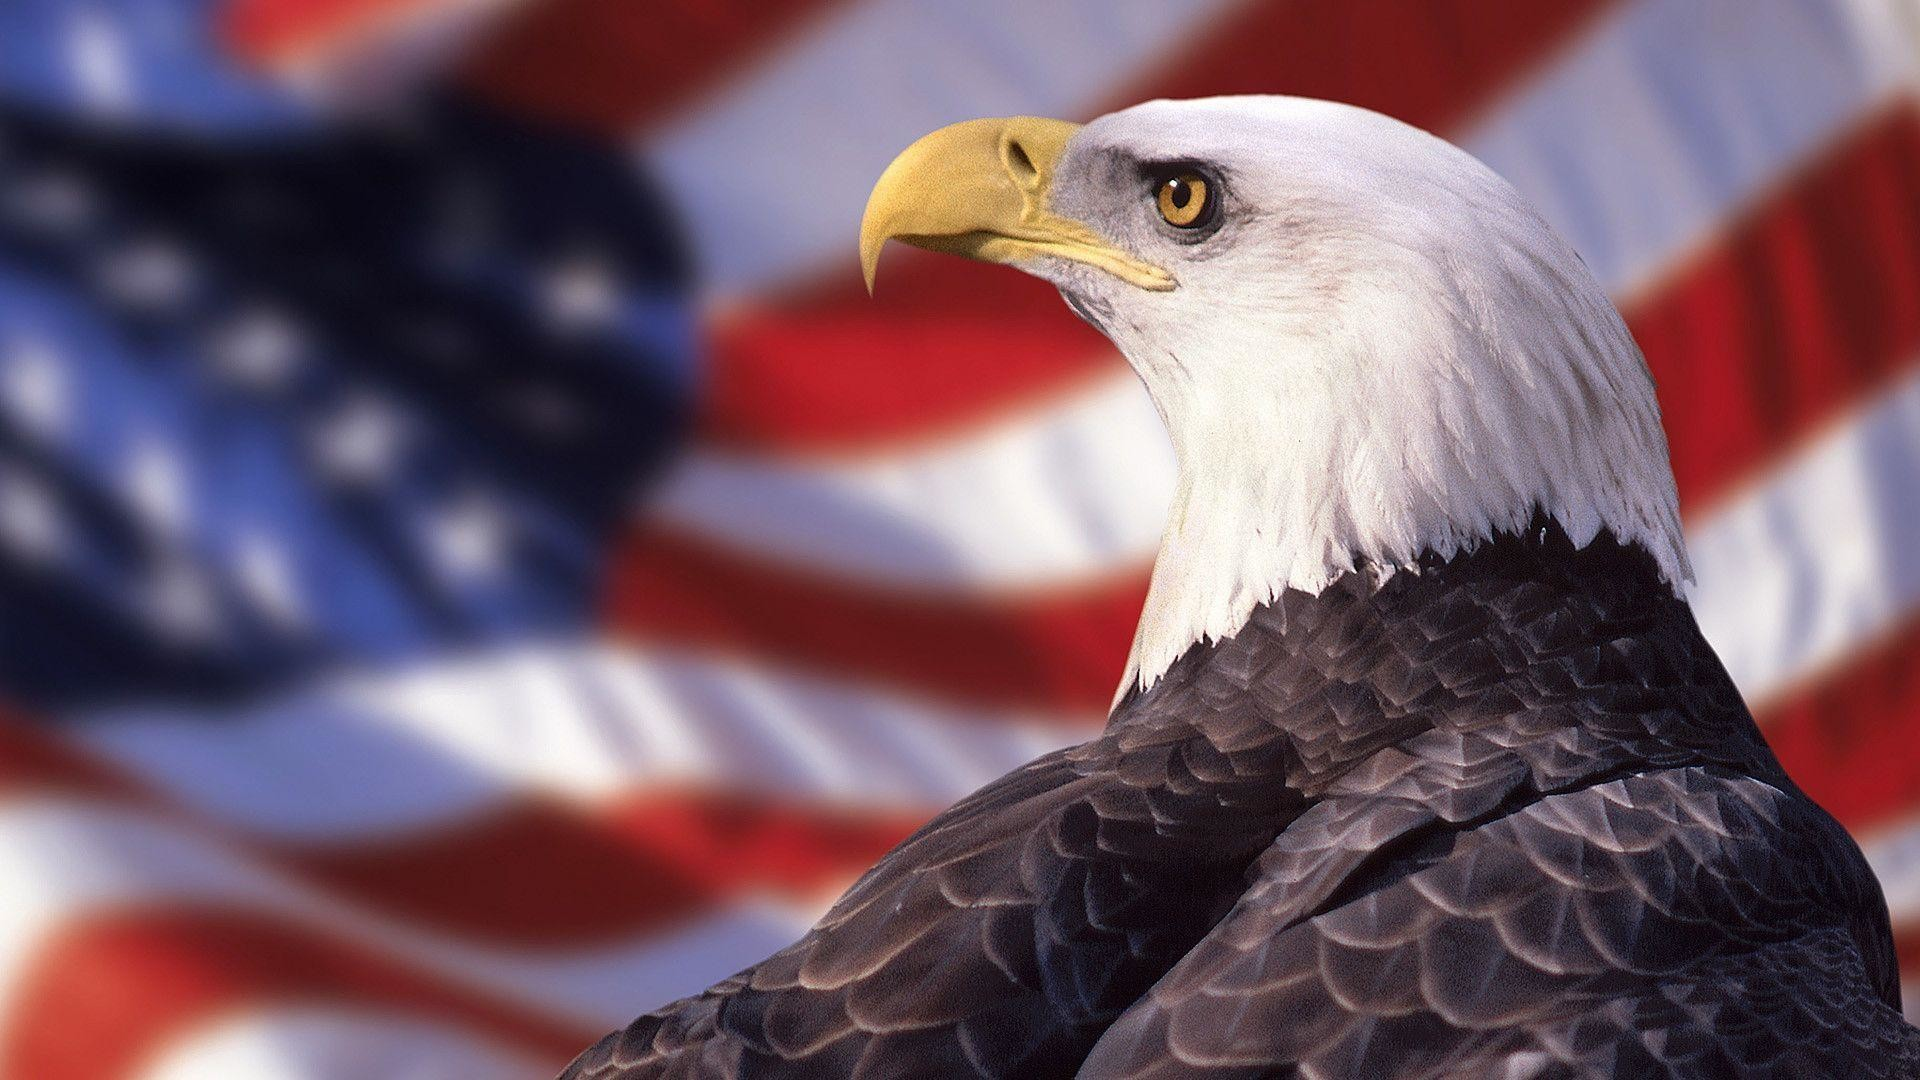 Bald Eagle American Flag Wallpaper   Best Free Wallpaper